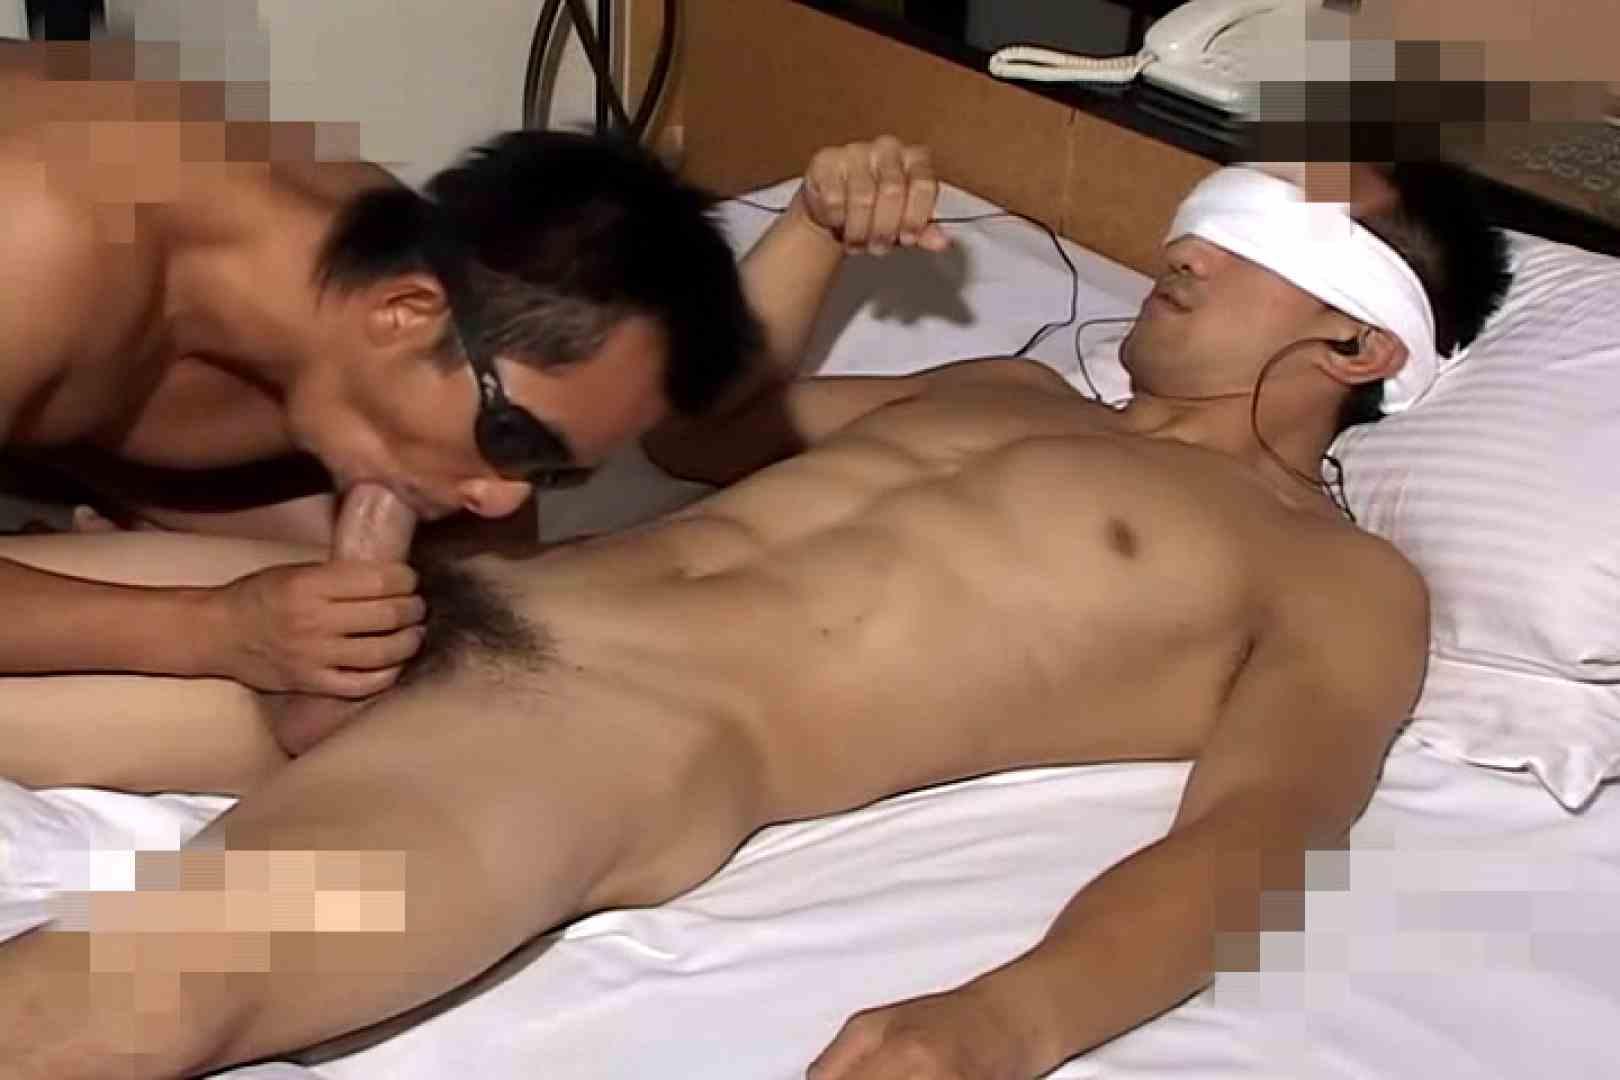 Beautiful muscle モッコリ野郎達!Vol.06 生挿入シーン ゲイ無修正ビデオ画像 90枚 55